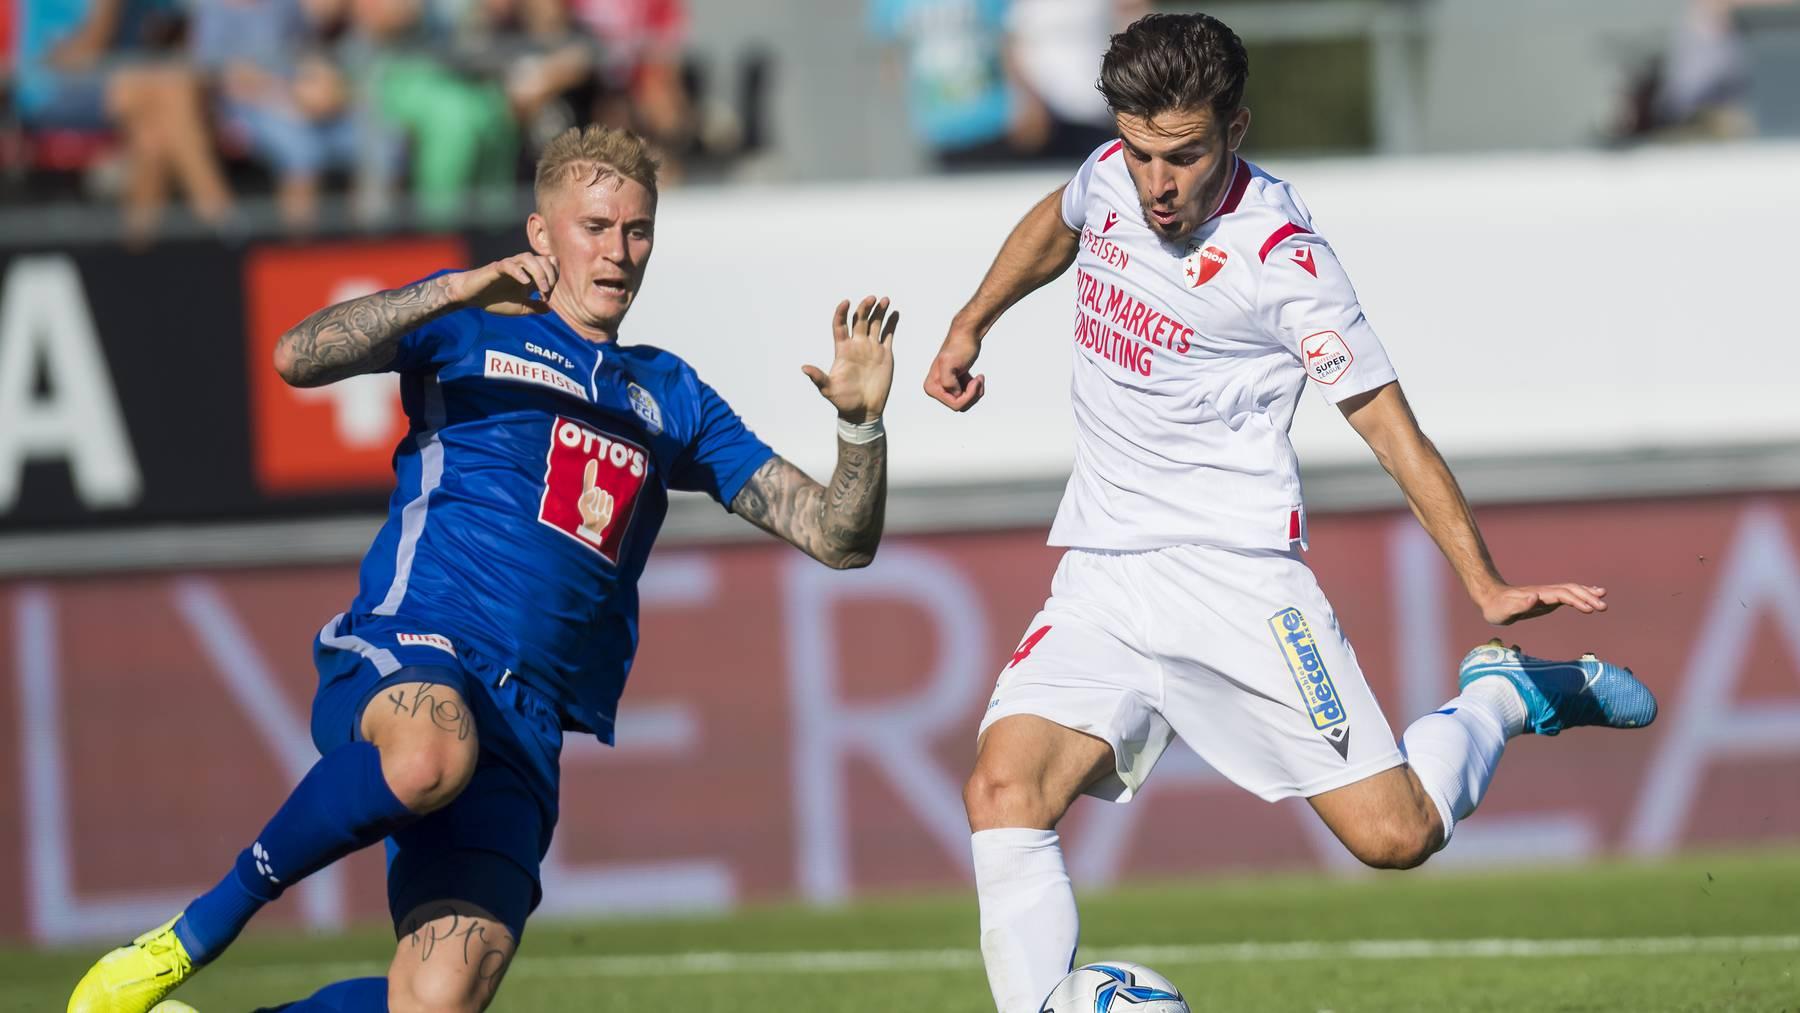 FCL-Spieler Marvin Schulz setzt zum Tackling gegen Sions Bastien Toma an.